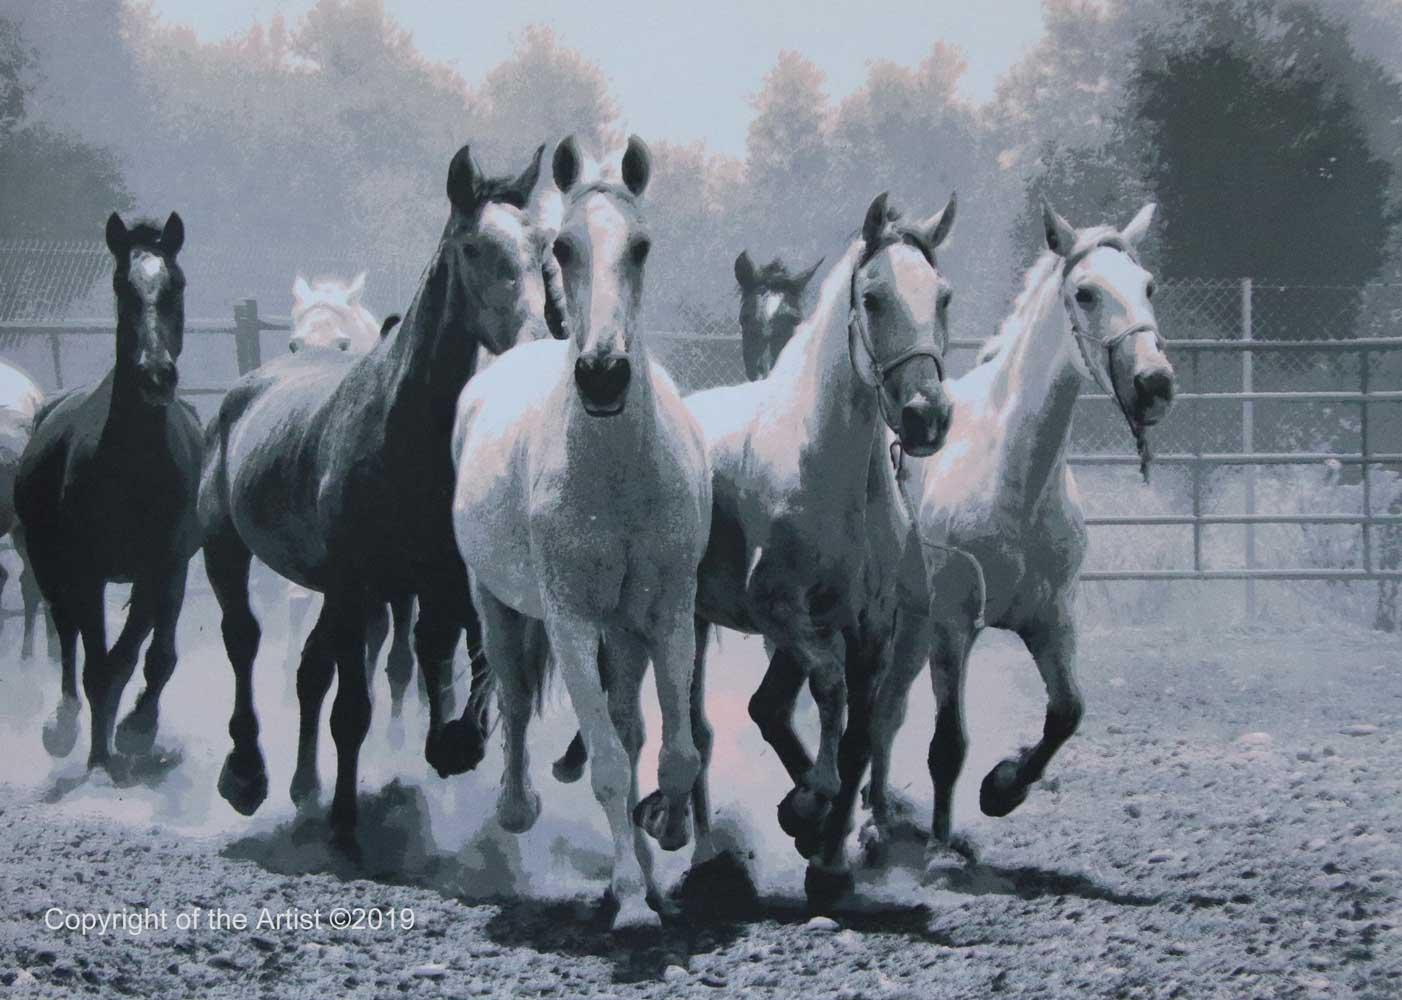 painting art equestrian exhibition horse in art silkscreen print